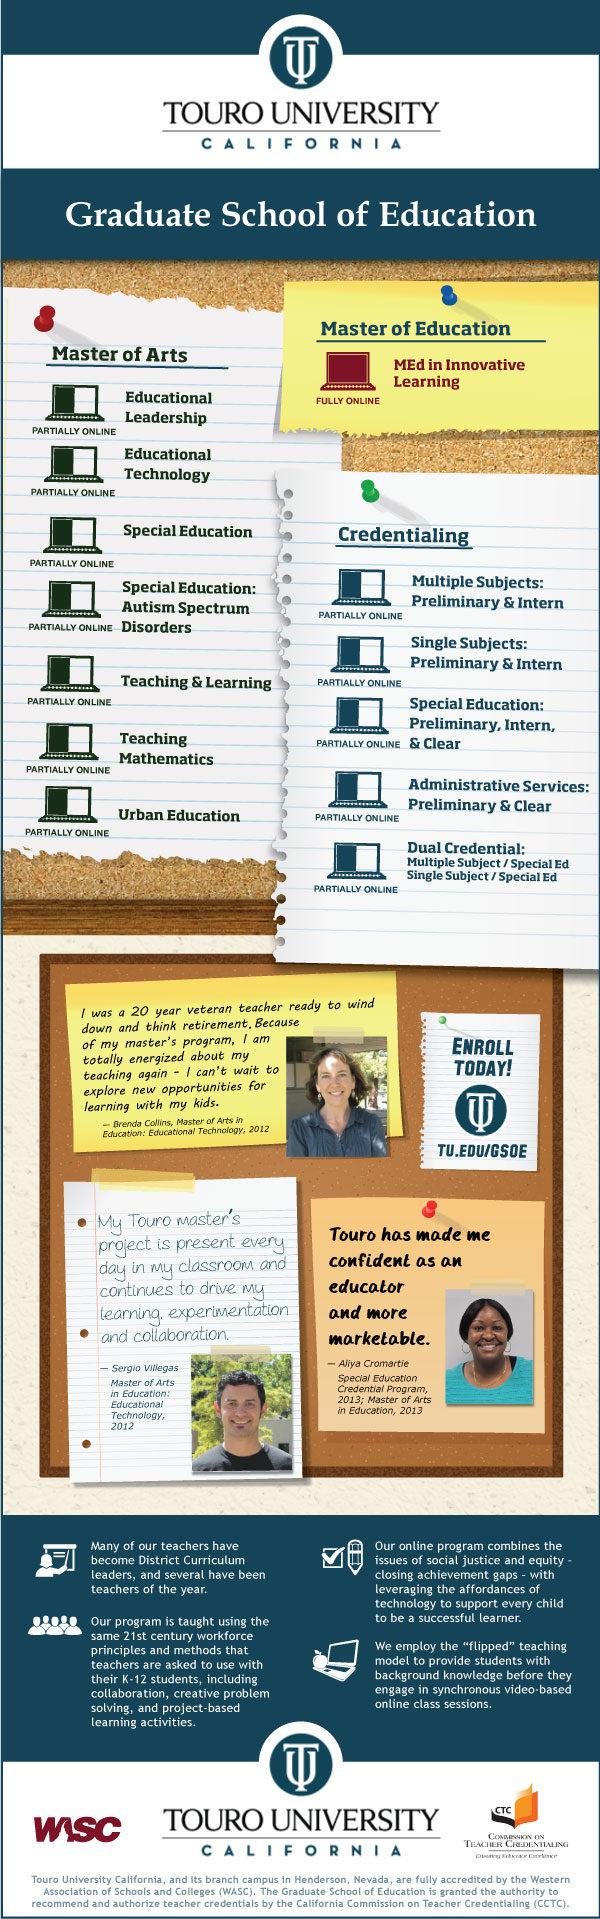 Touro University California Infographic